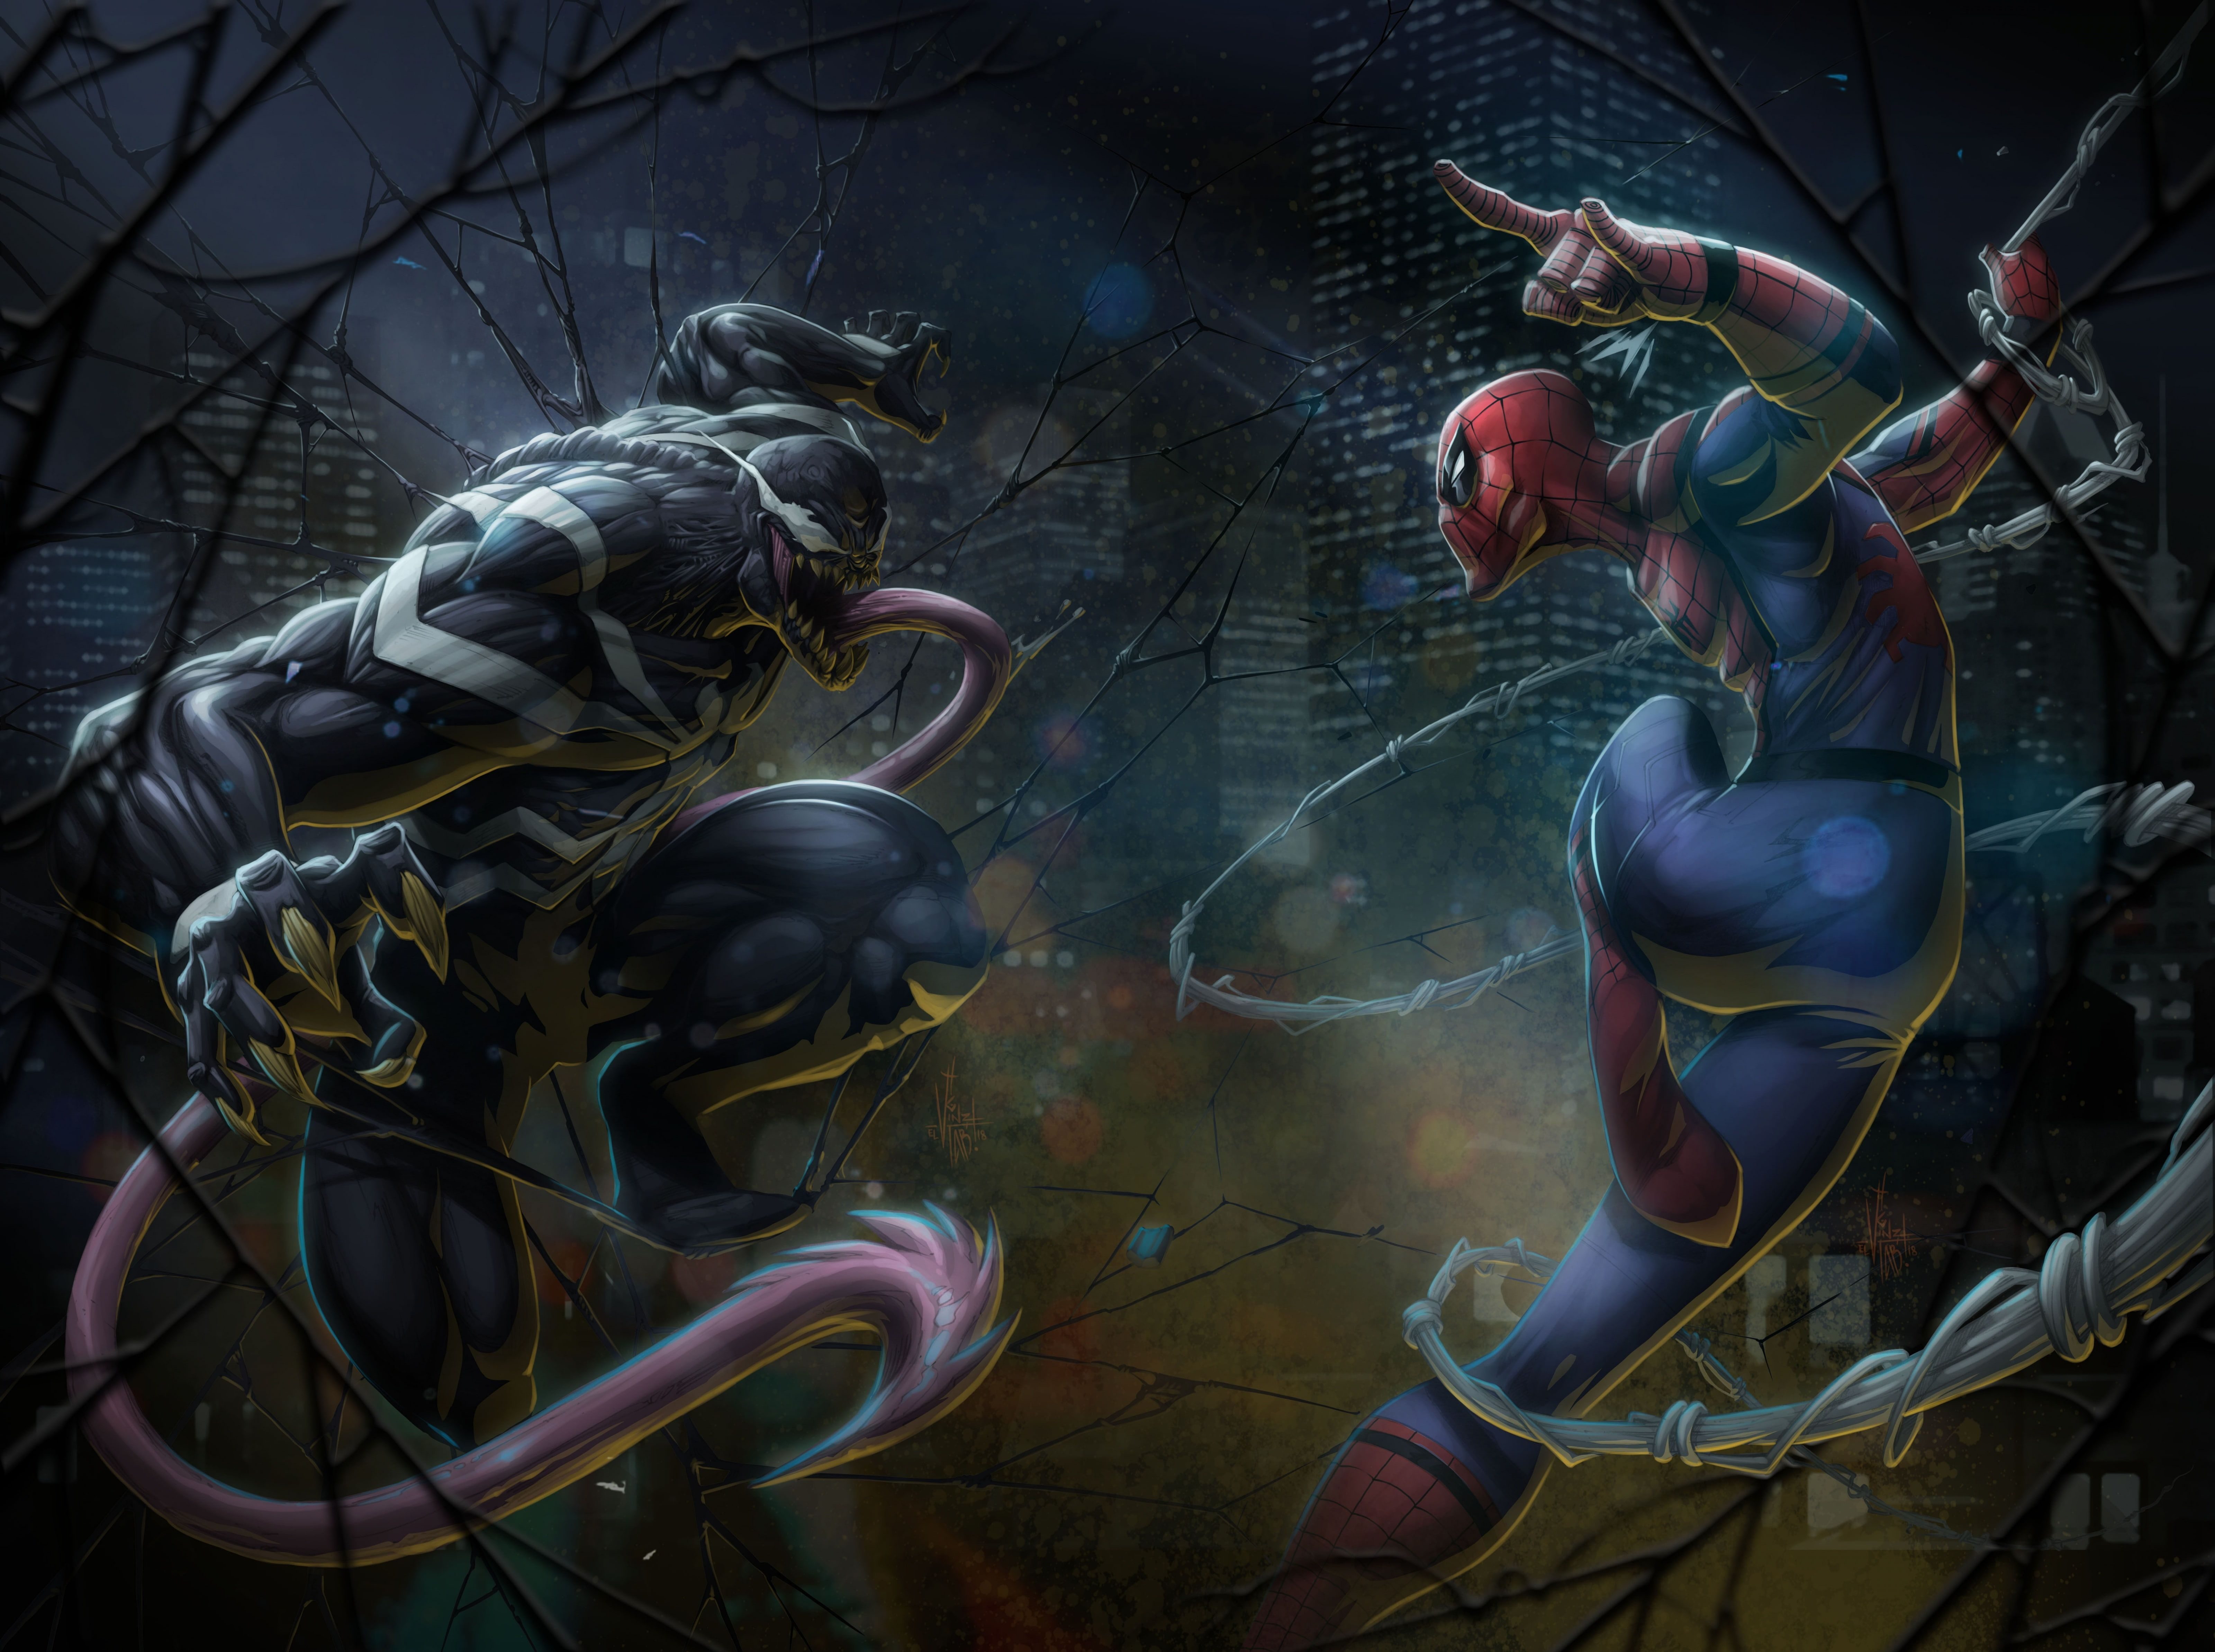 Marvel Comics Spider-Man vs Venom artwork #Artistic #Fantasy #Comics #Artwork #Superhero #Marvel #Spiderman #Venom #supervillain #5K #wallpaper #hdwallpaper #desktop